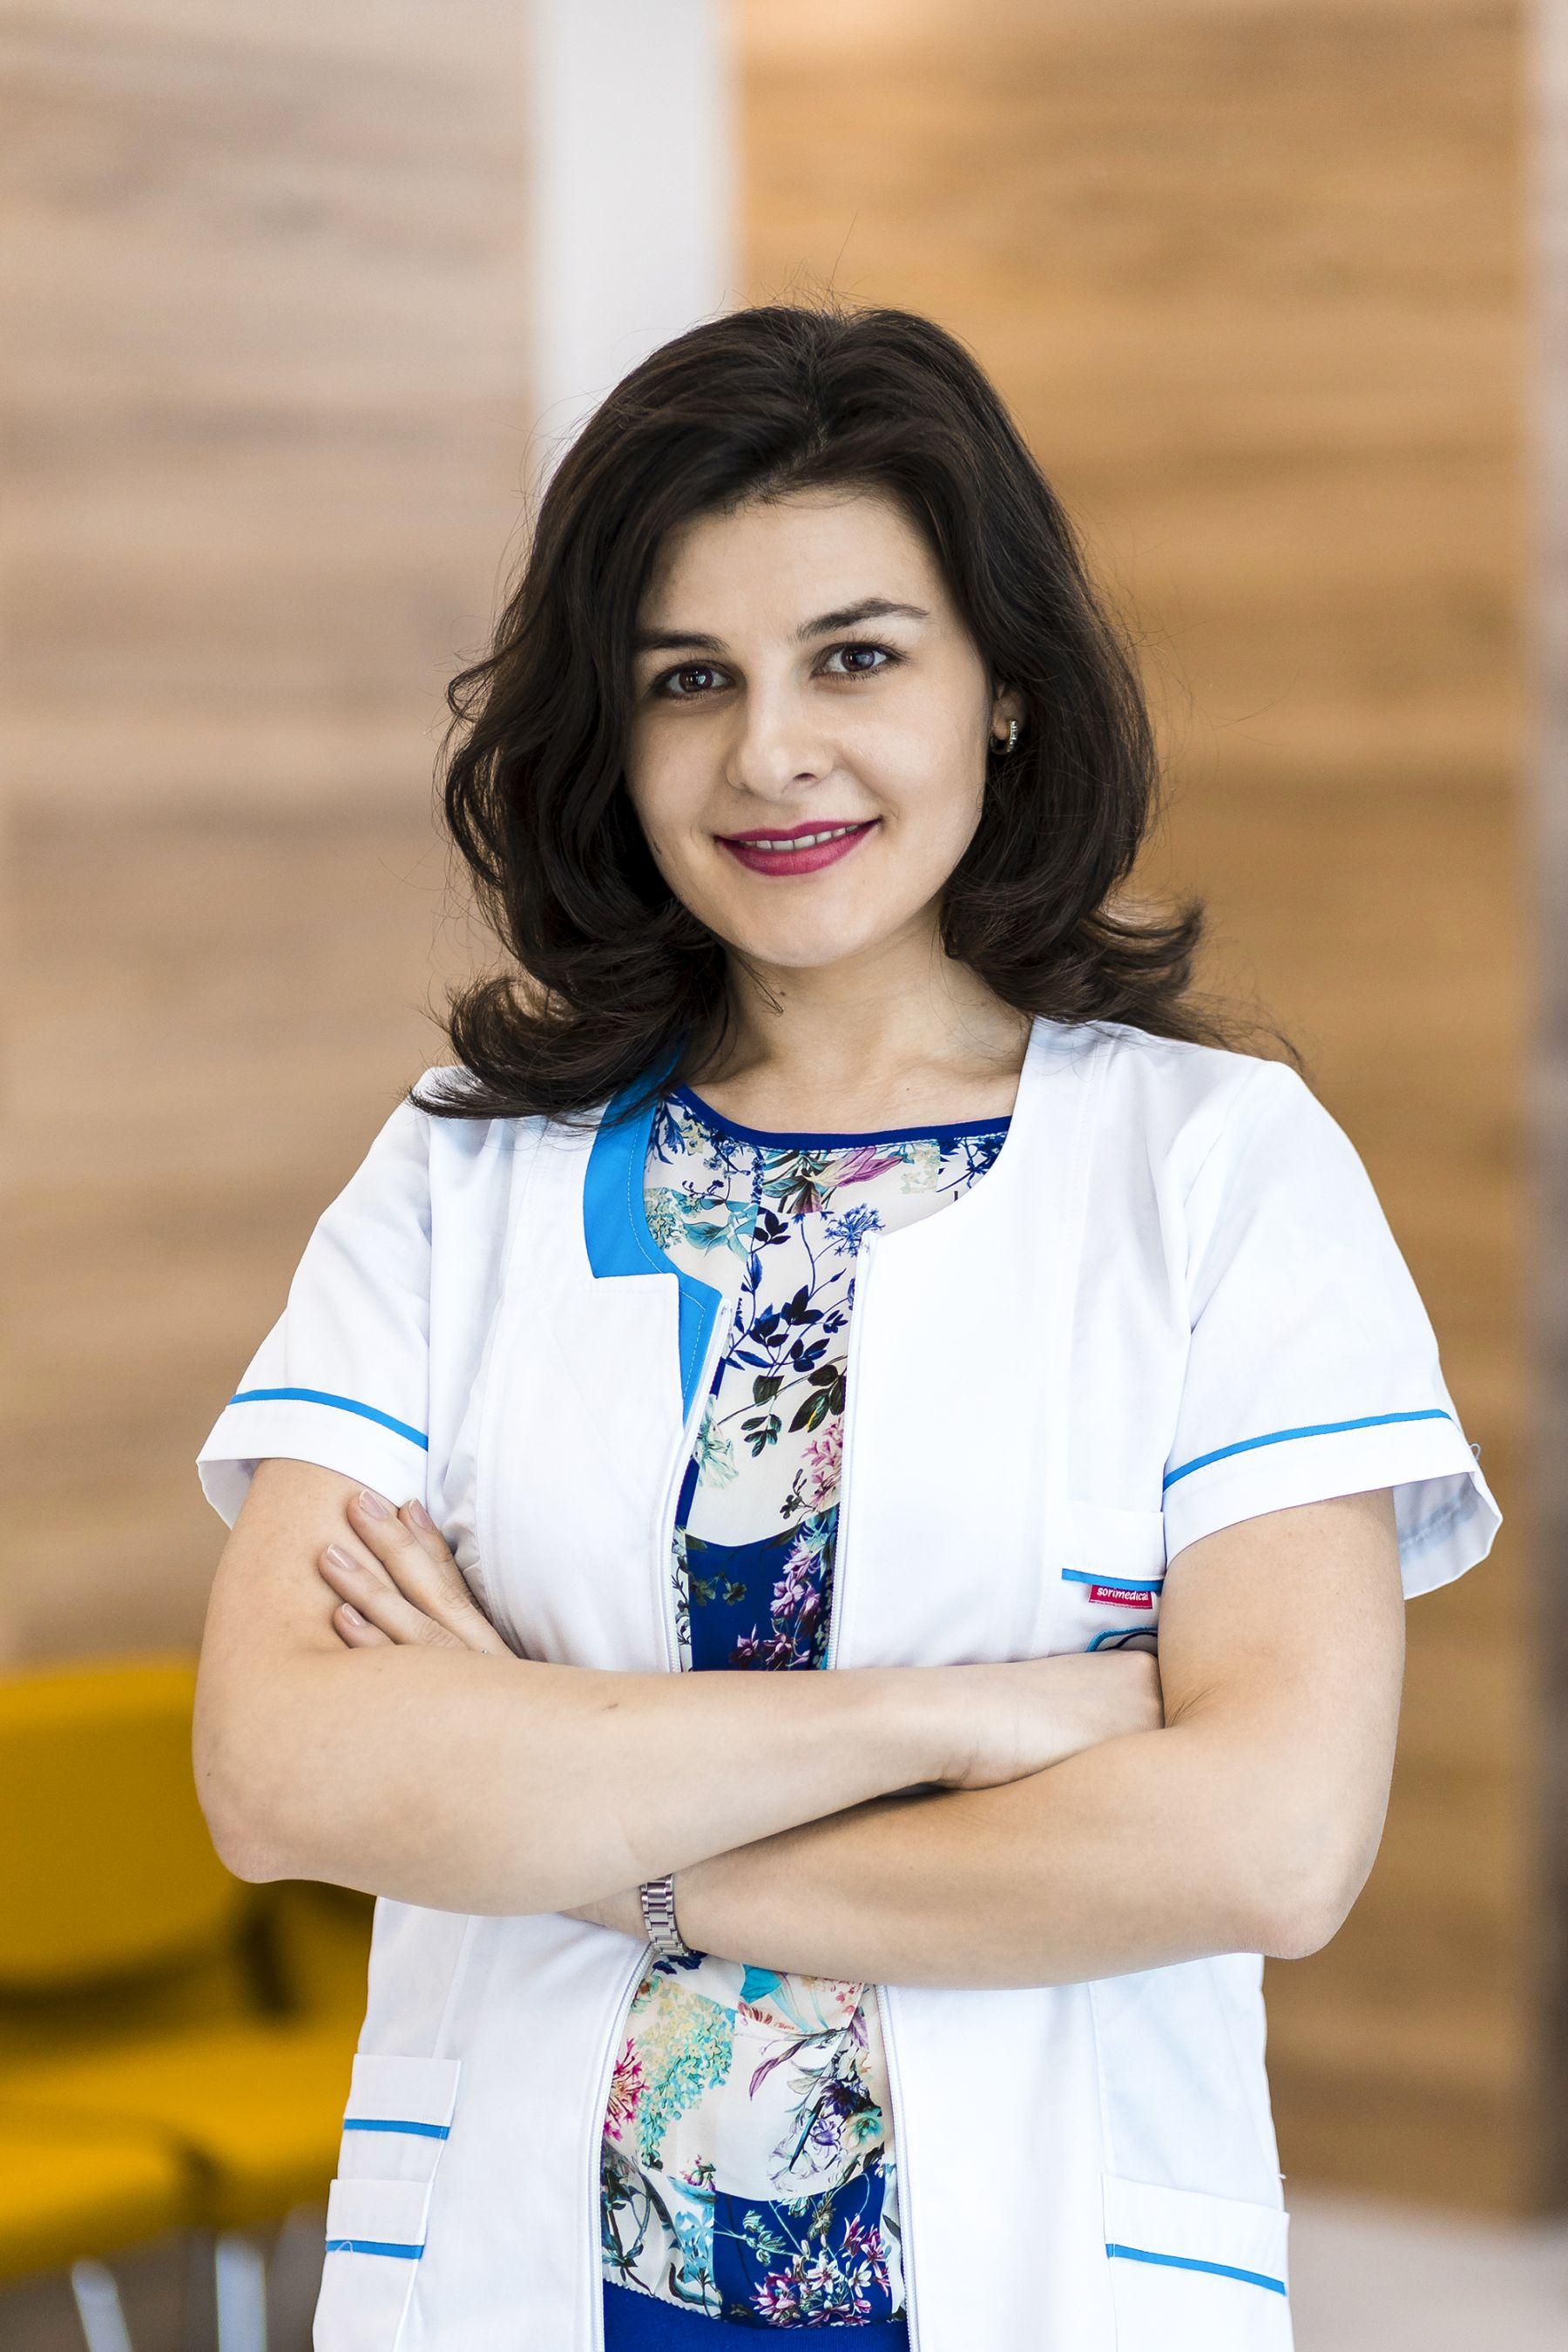 Asist. Univ. Dr. Morar Iulia Ioana : Medic specialist dermatovenerologie